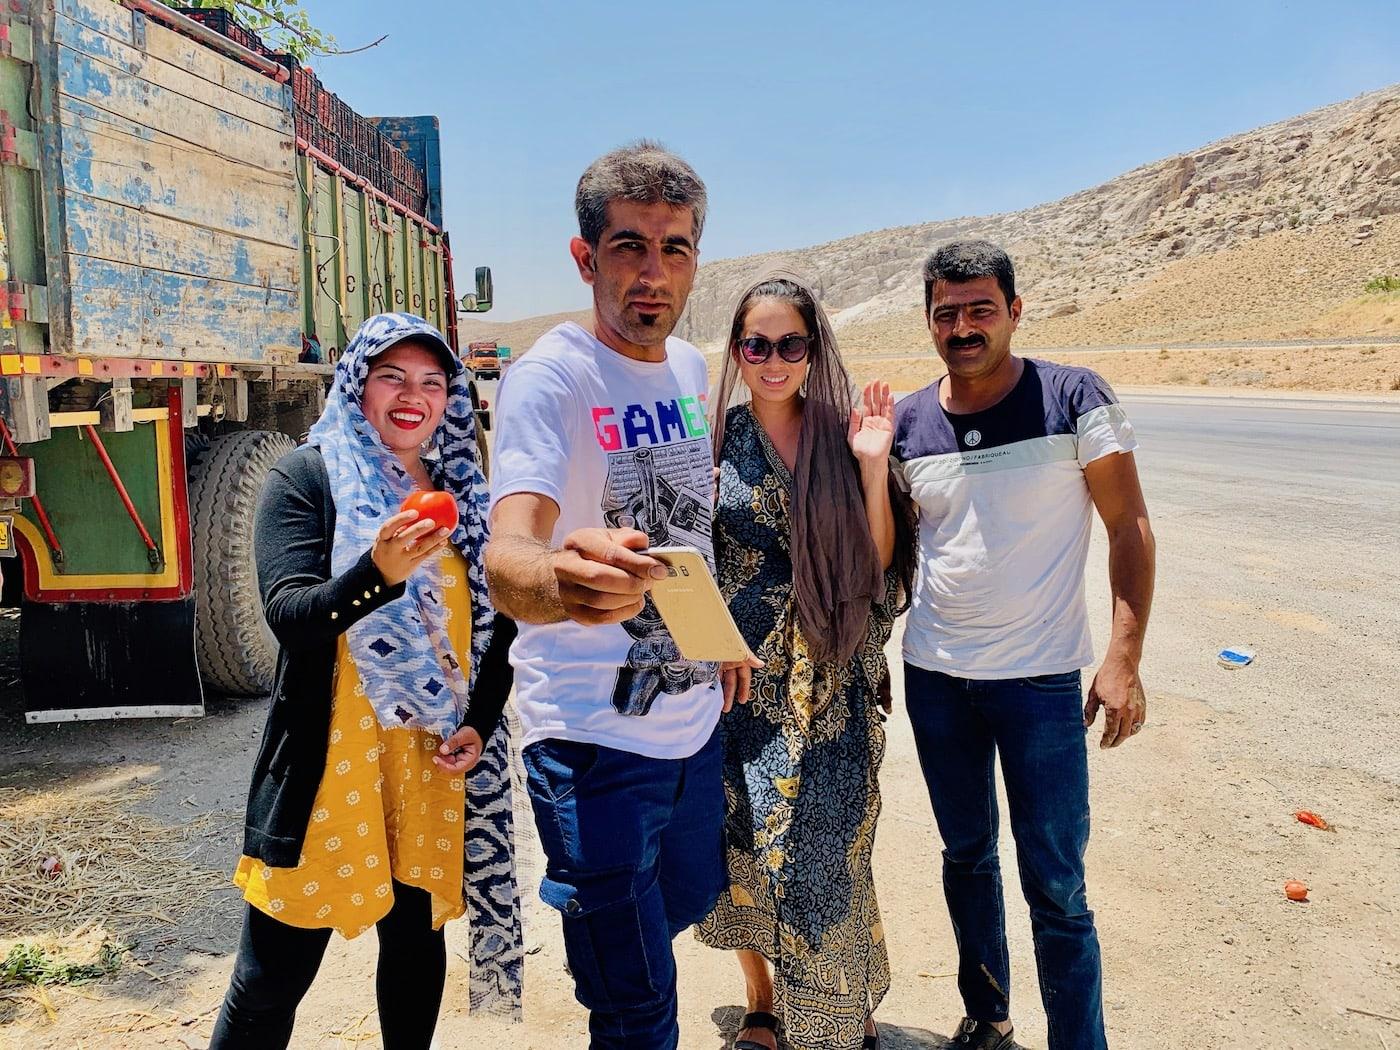 american tourist in iran